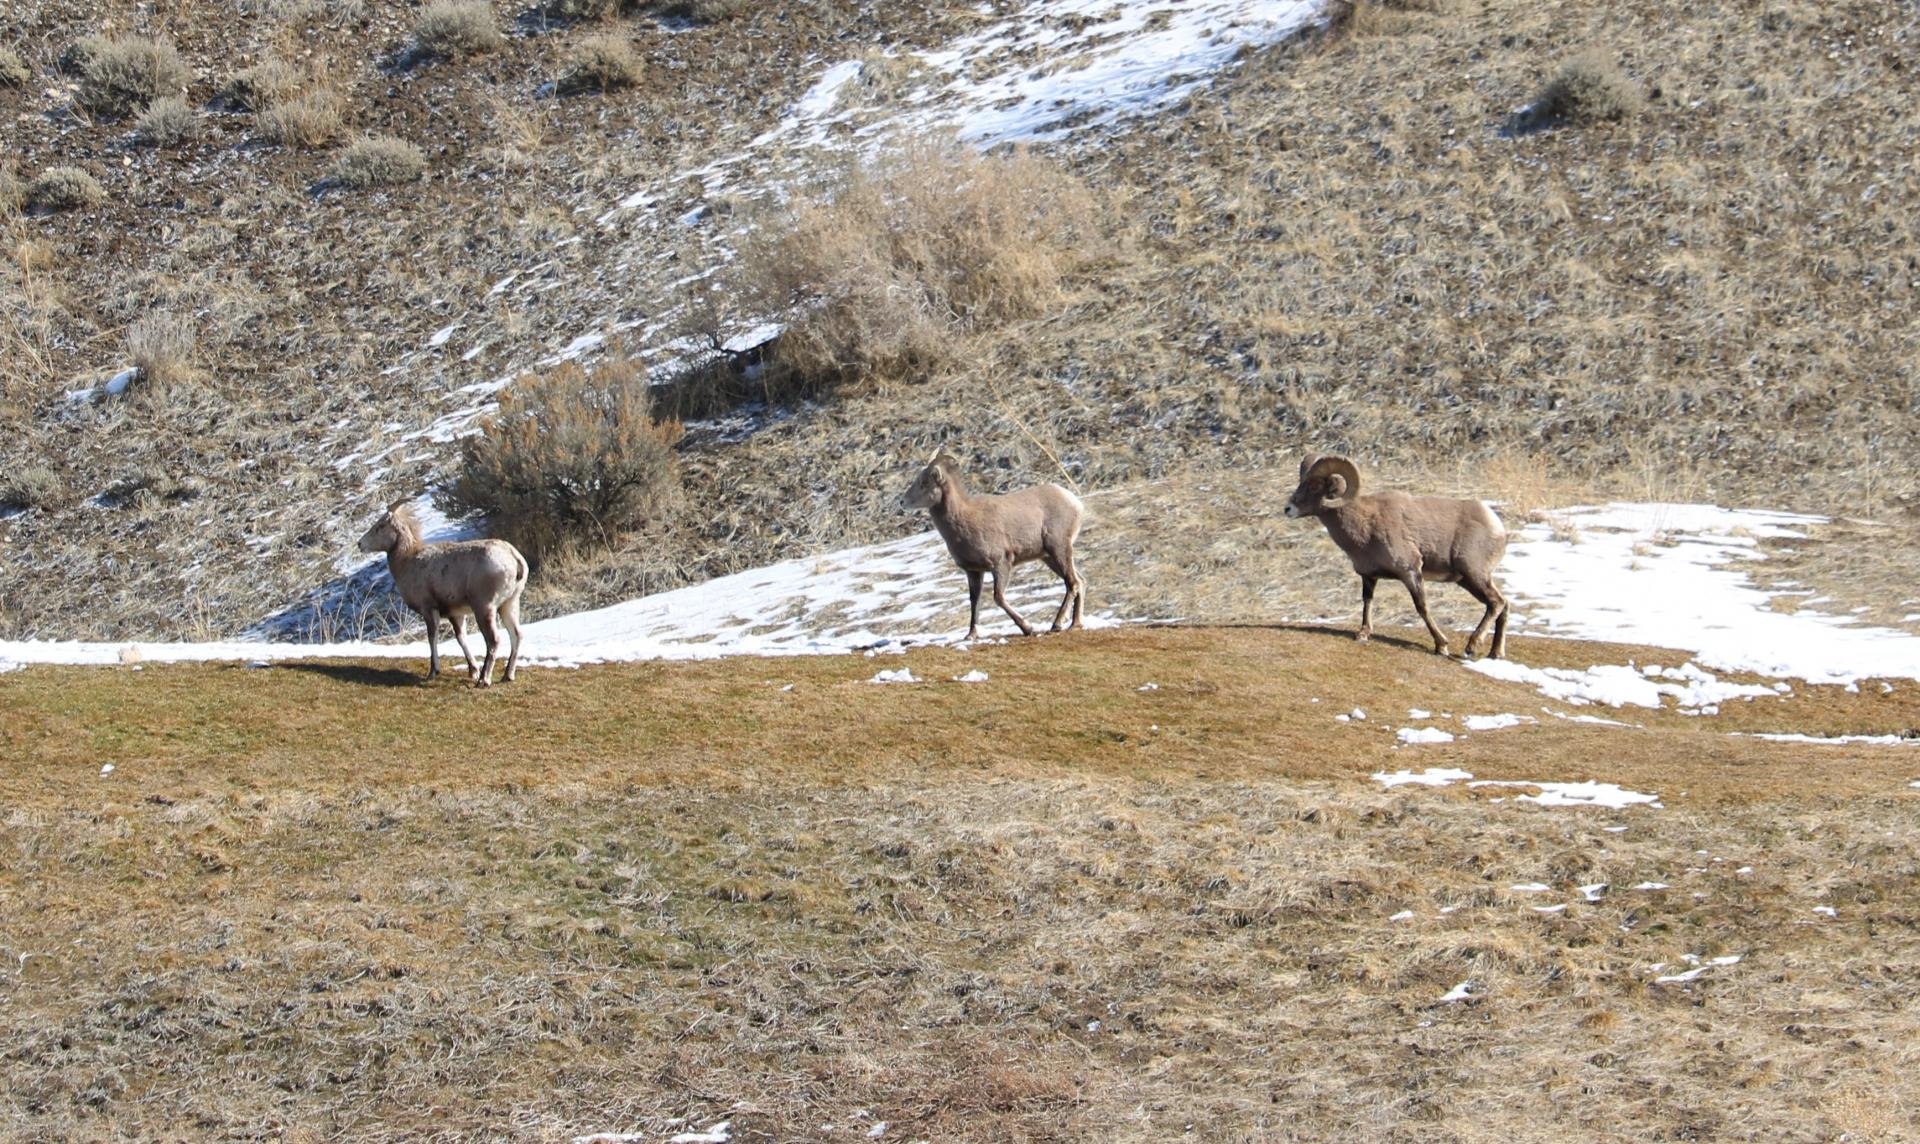 Click image for larger version  Name:Cedar Hills Sheep 2.jpg Views:122 Size:533.0 KB ID:146339